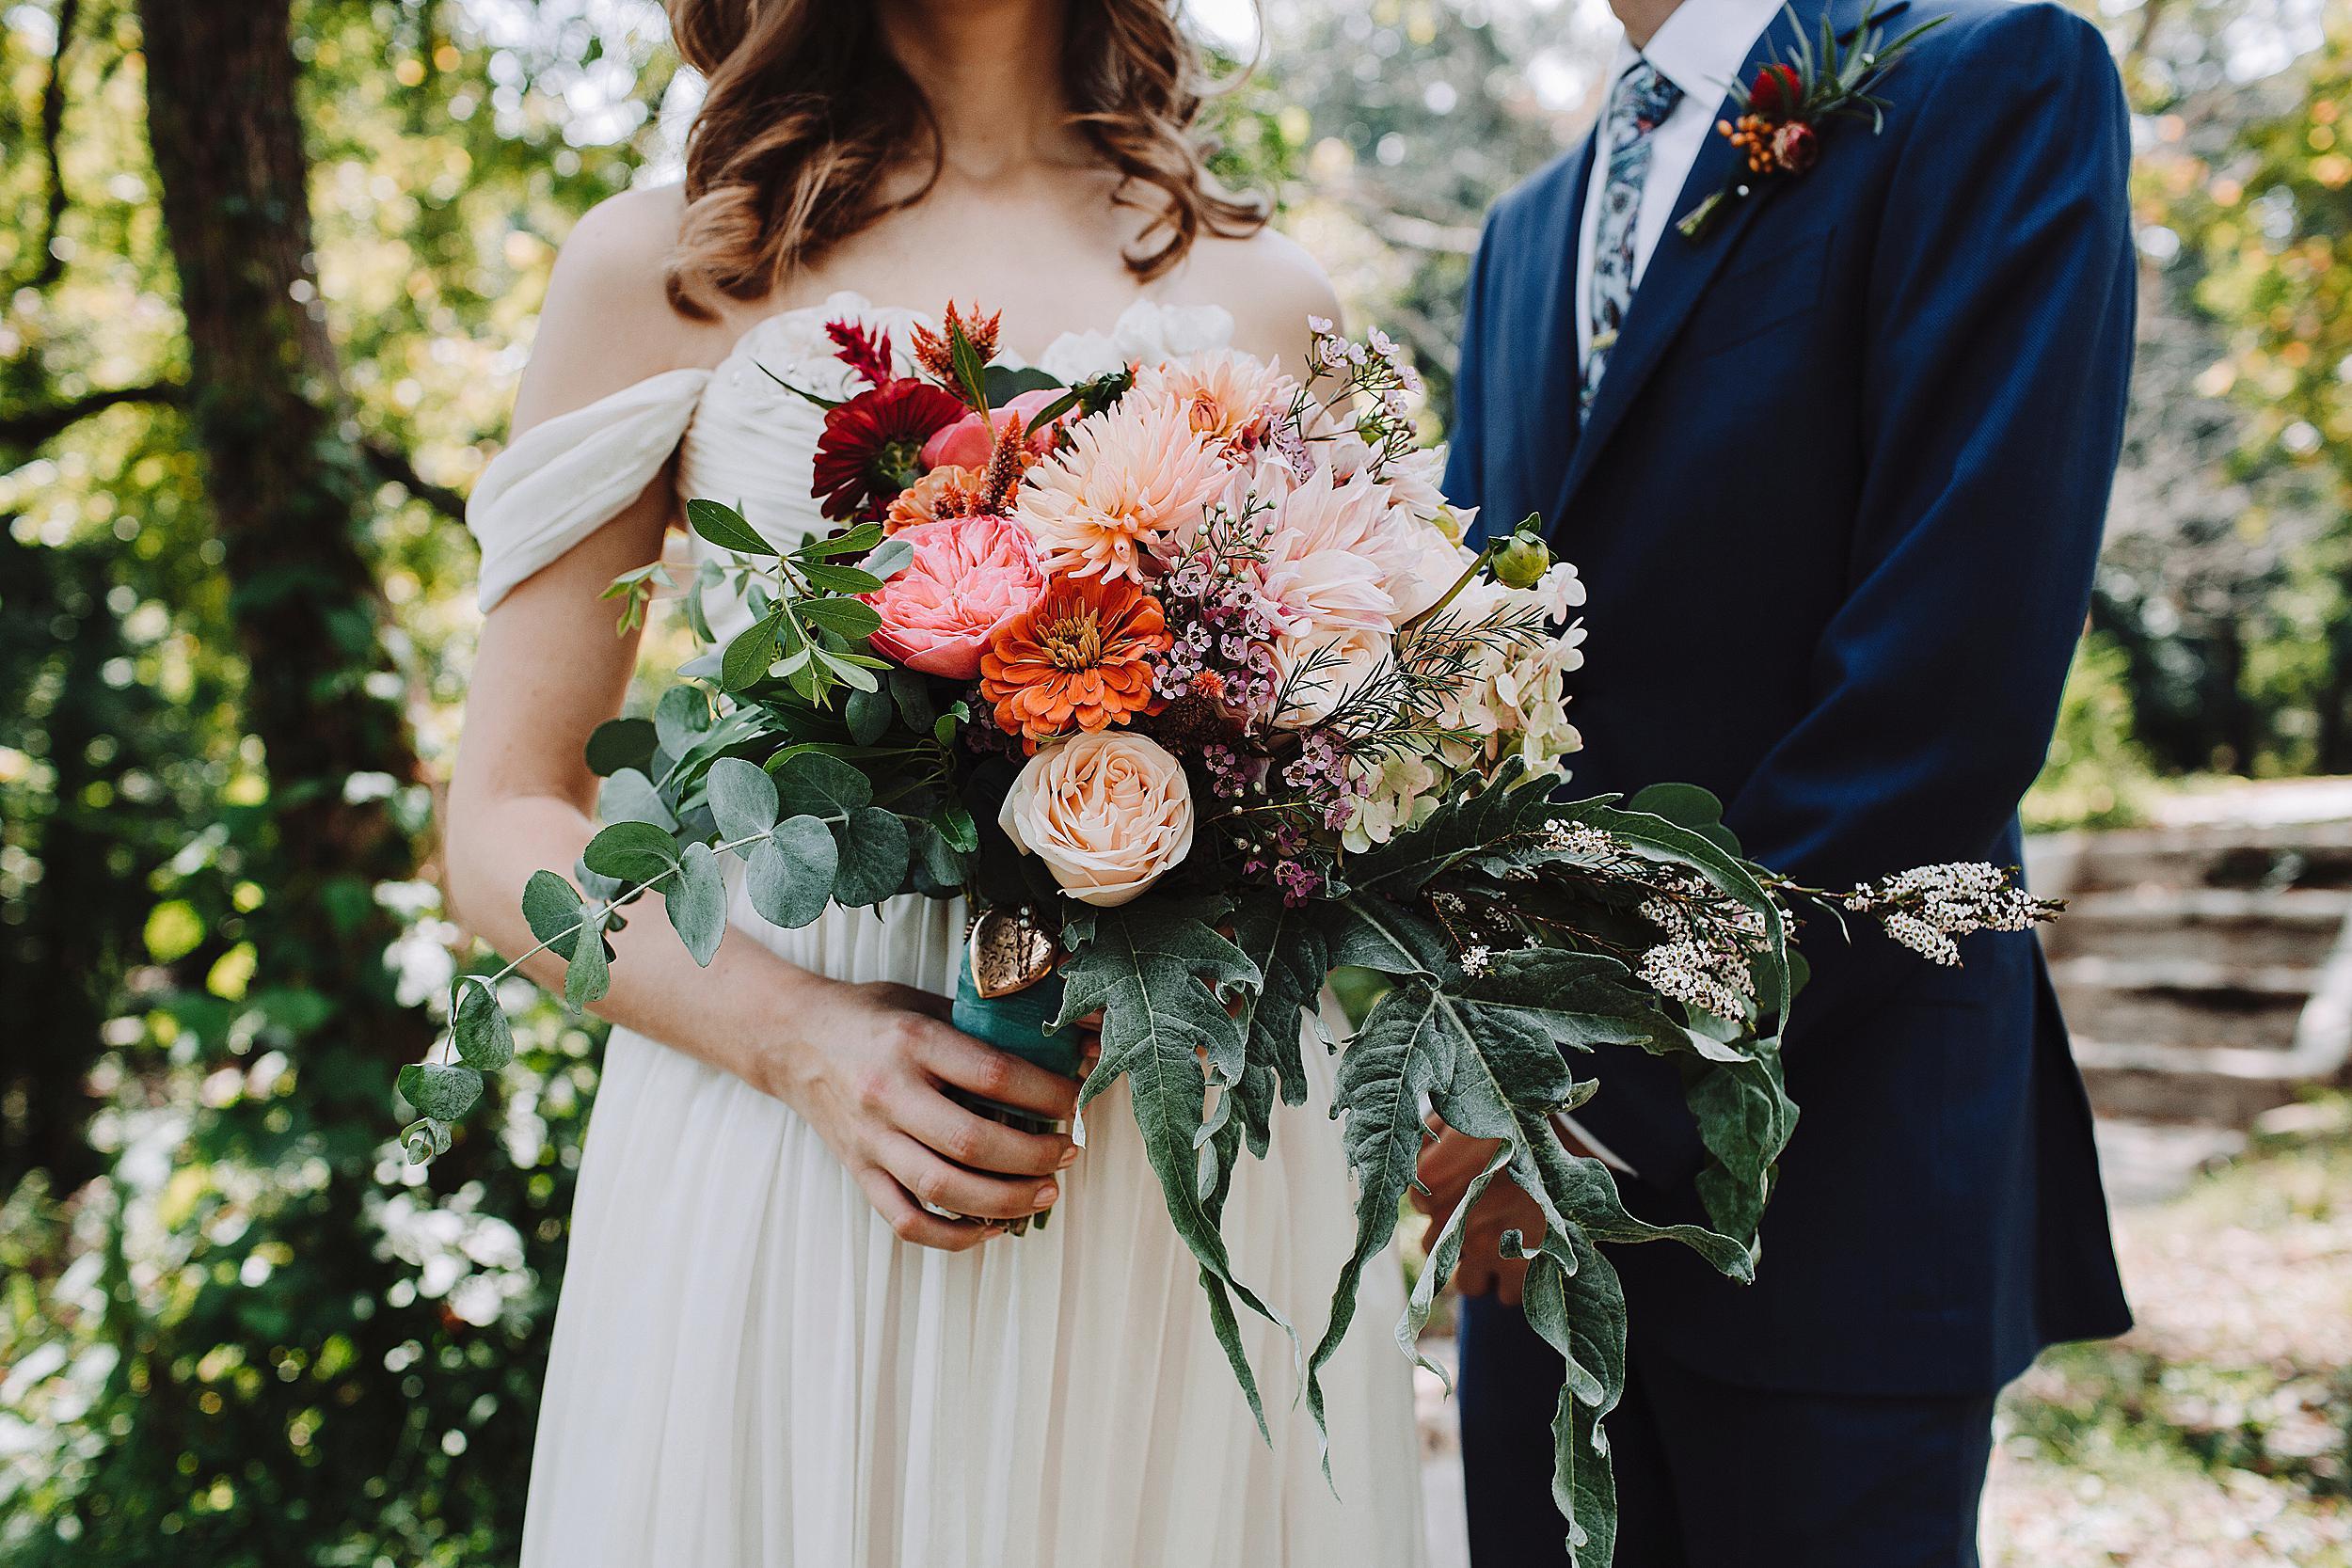 historic_shady_lane_wedding_with_love_and_embers-005.JPG